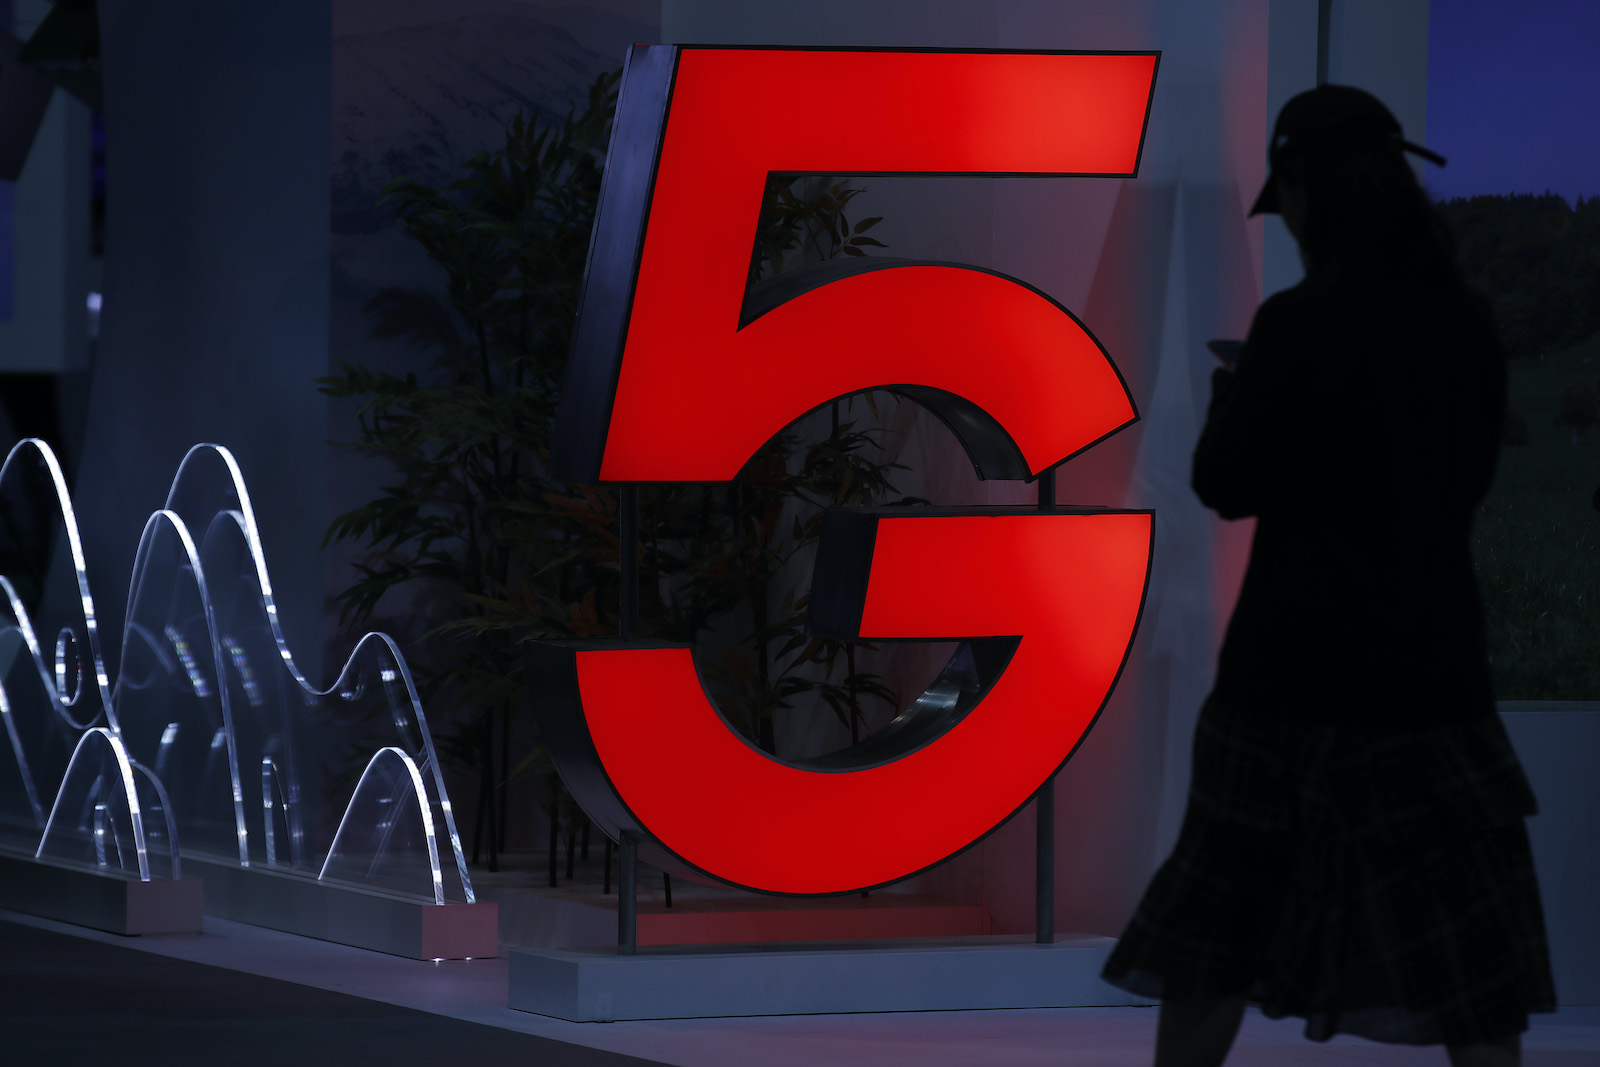 O-RAN no near-term challenger to Huawei, Ericsson